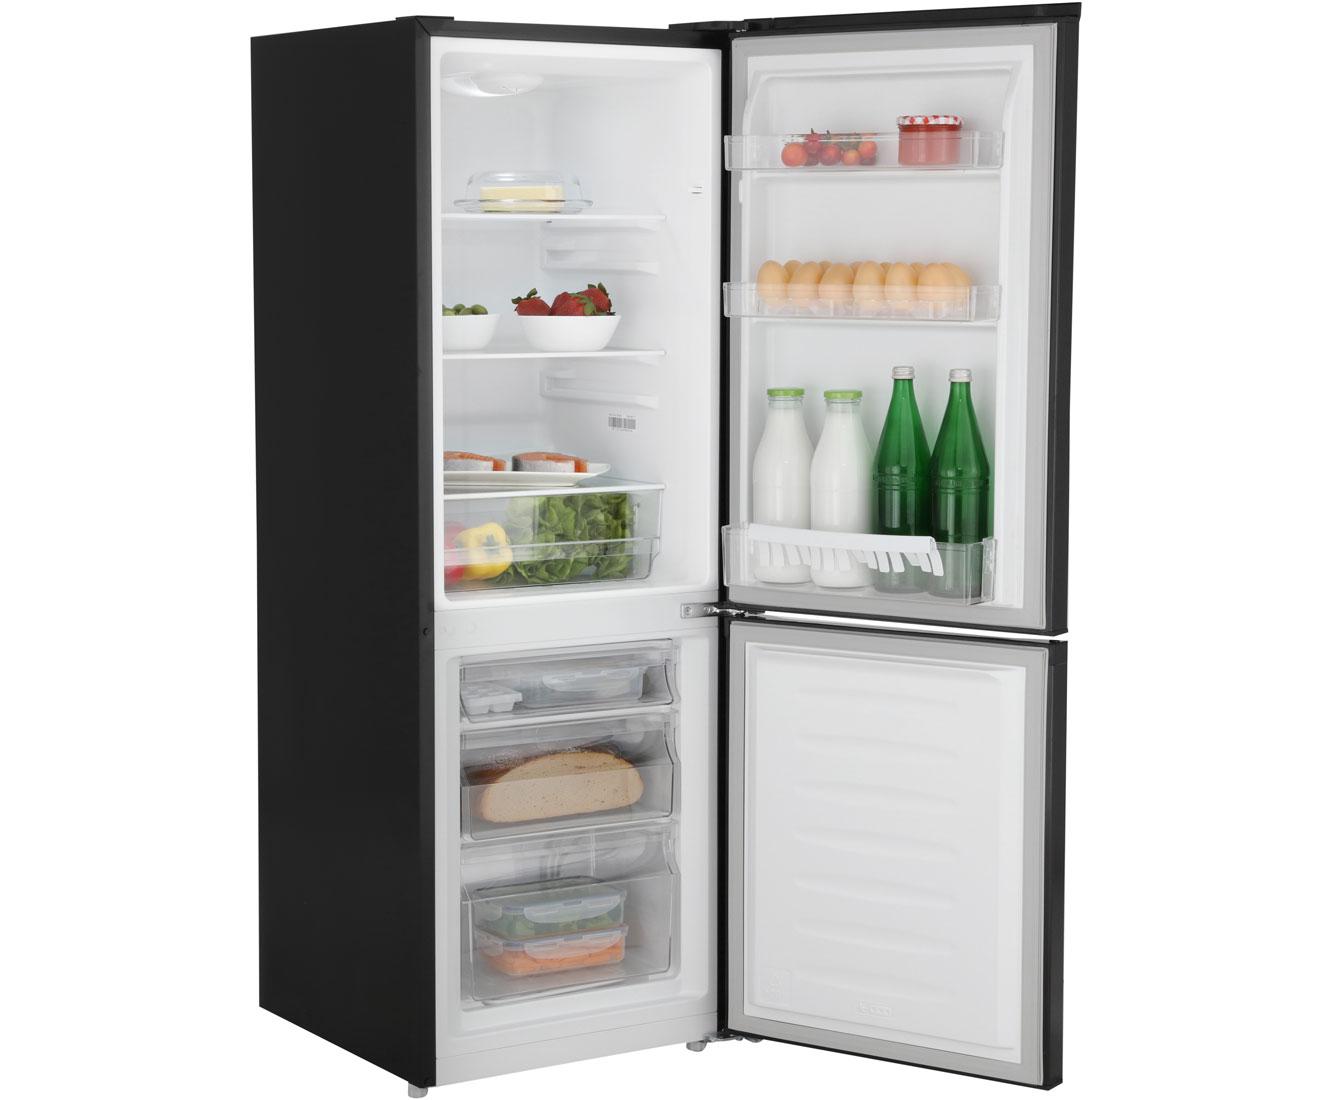 Bomann Kühlschrank Türanschlag Wechseln : Bomann kg 322 kühl gefrierkombination edelstahl optik a